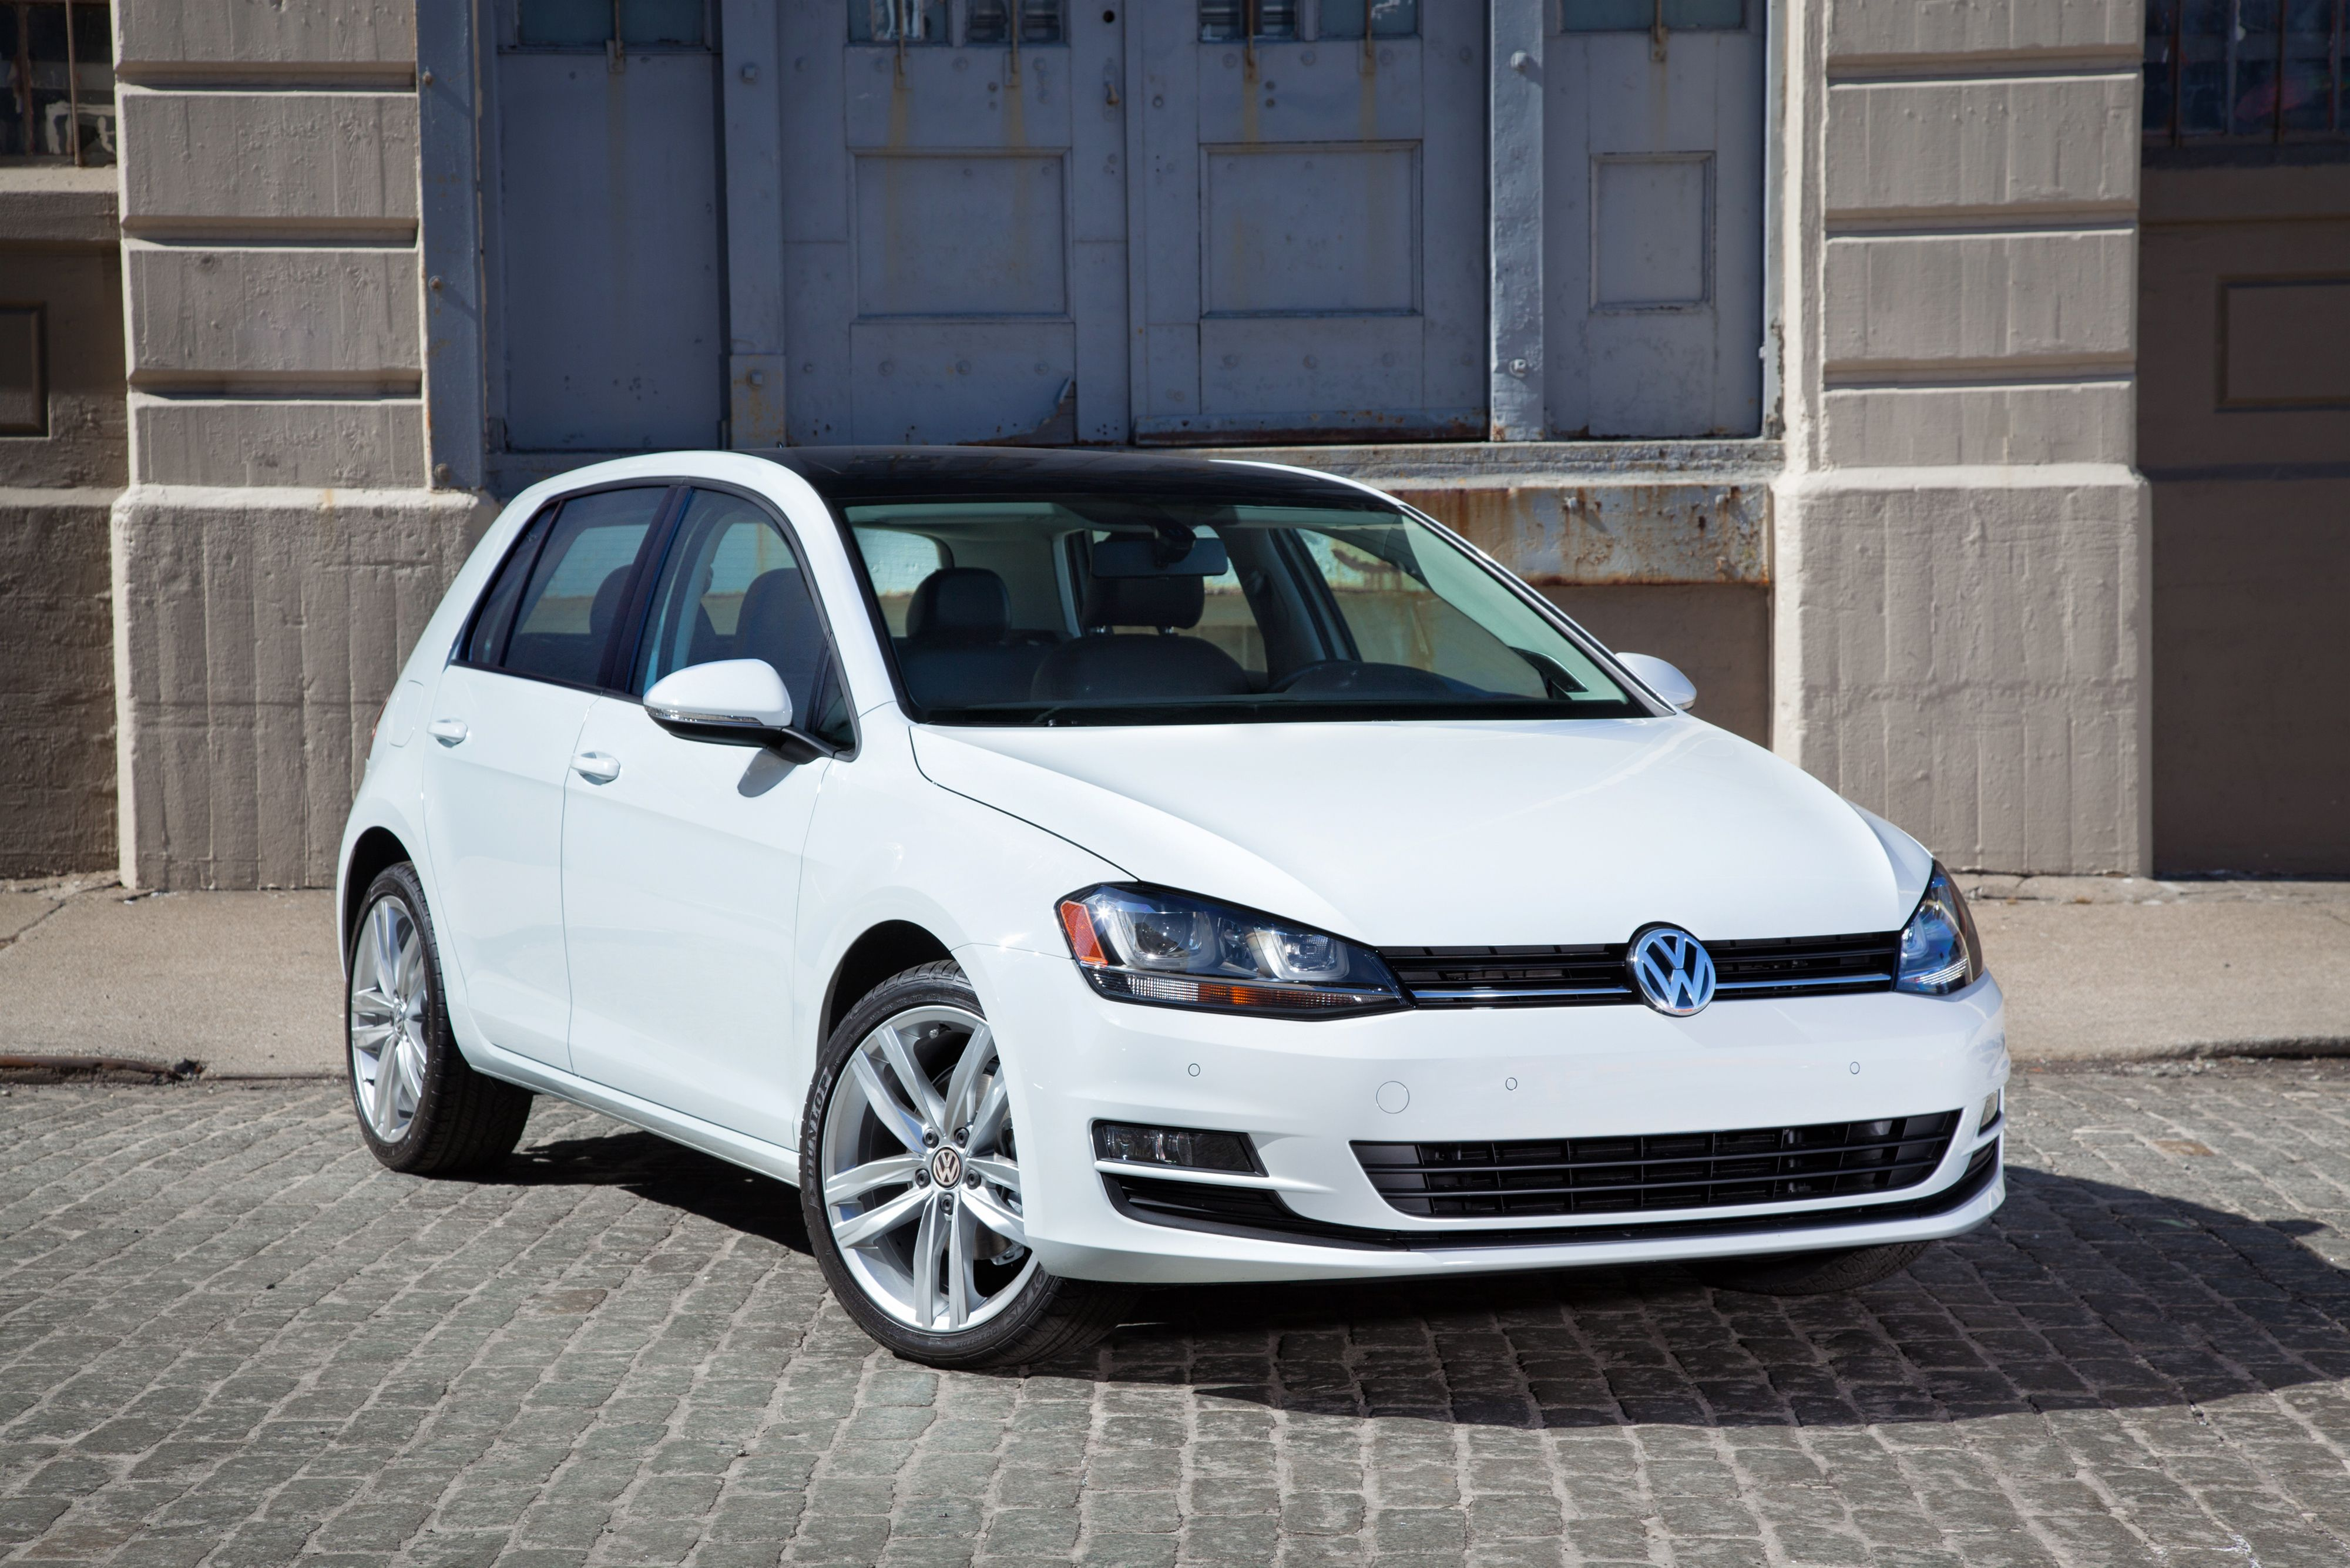 Stick Shift 2015 Volkswagen Golf Tdi Vw Golf Tdi Volkswagen